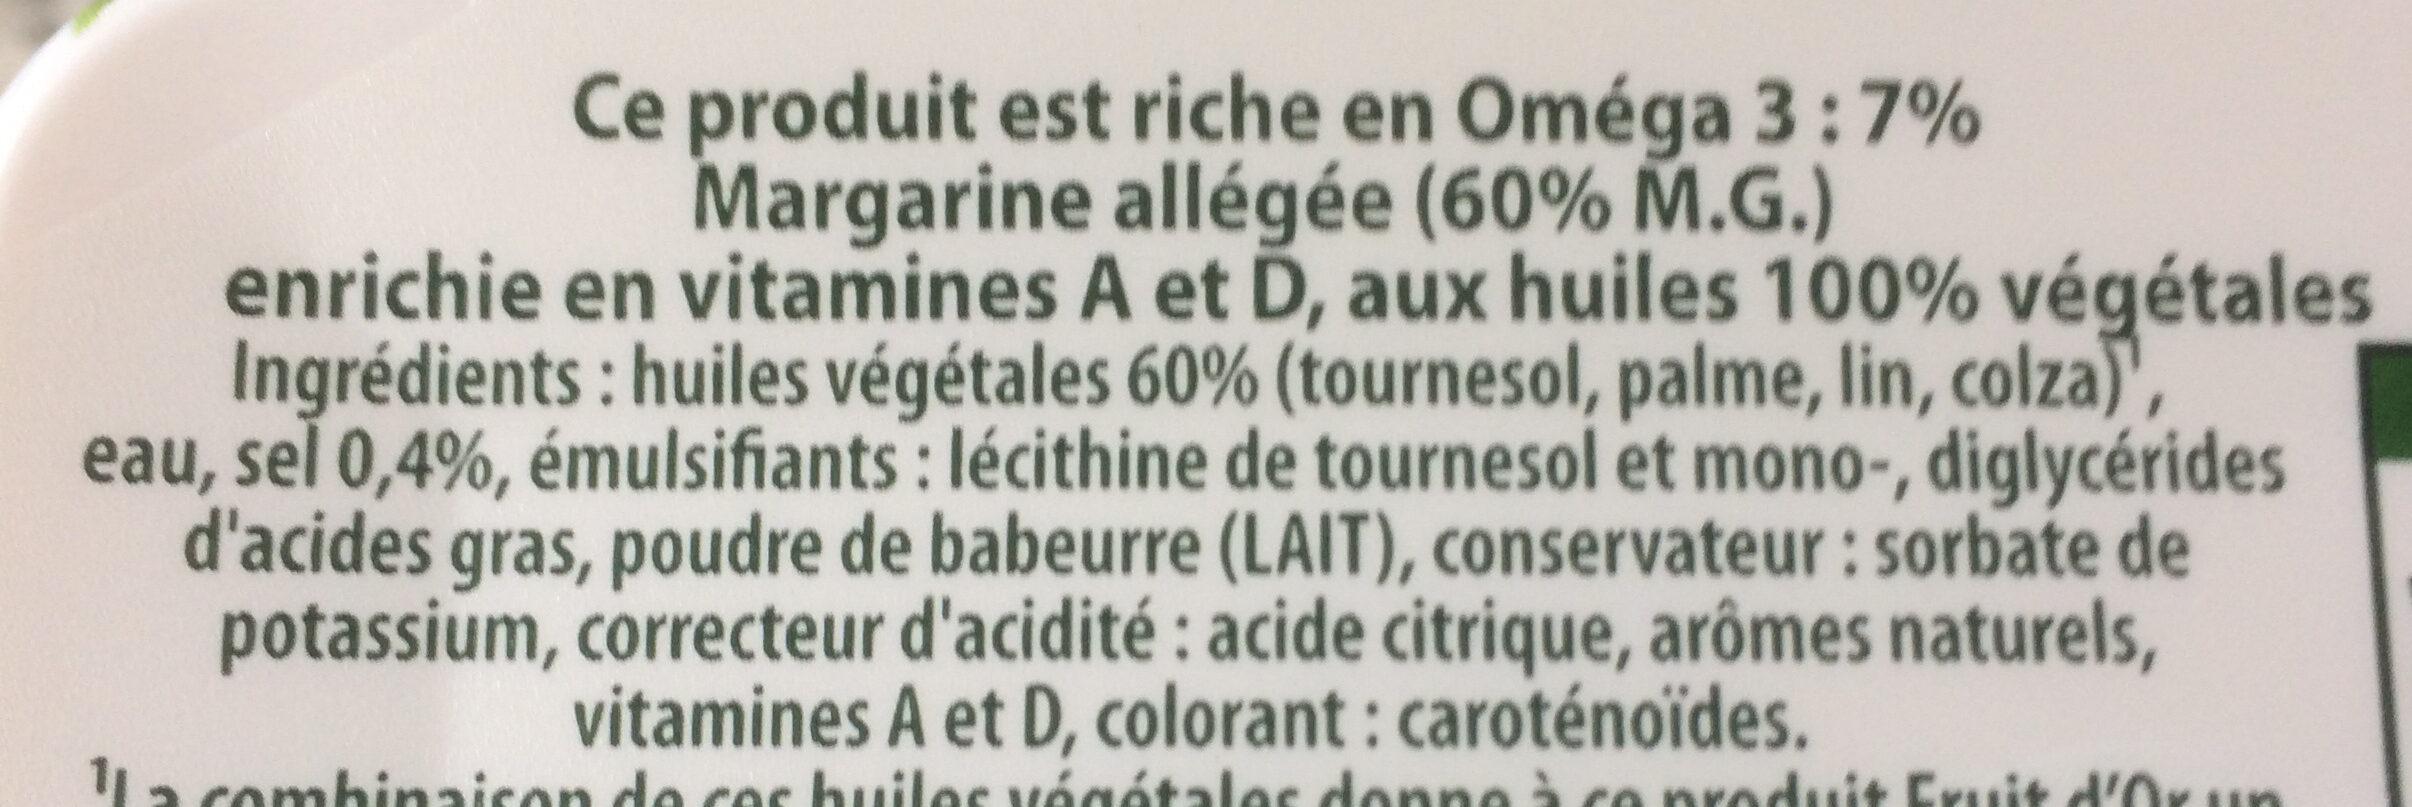 Fruit d'or doux - Ingredients